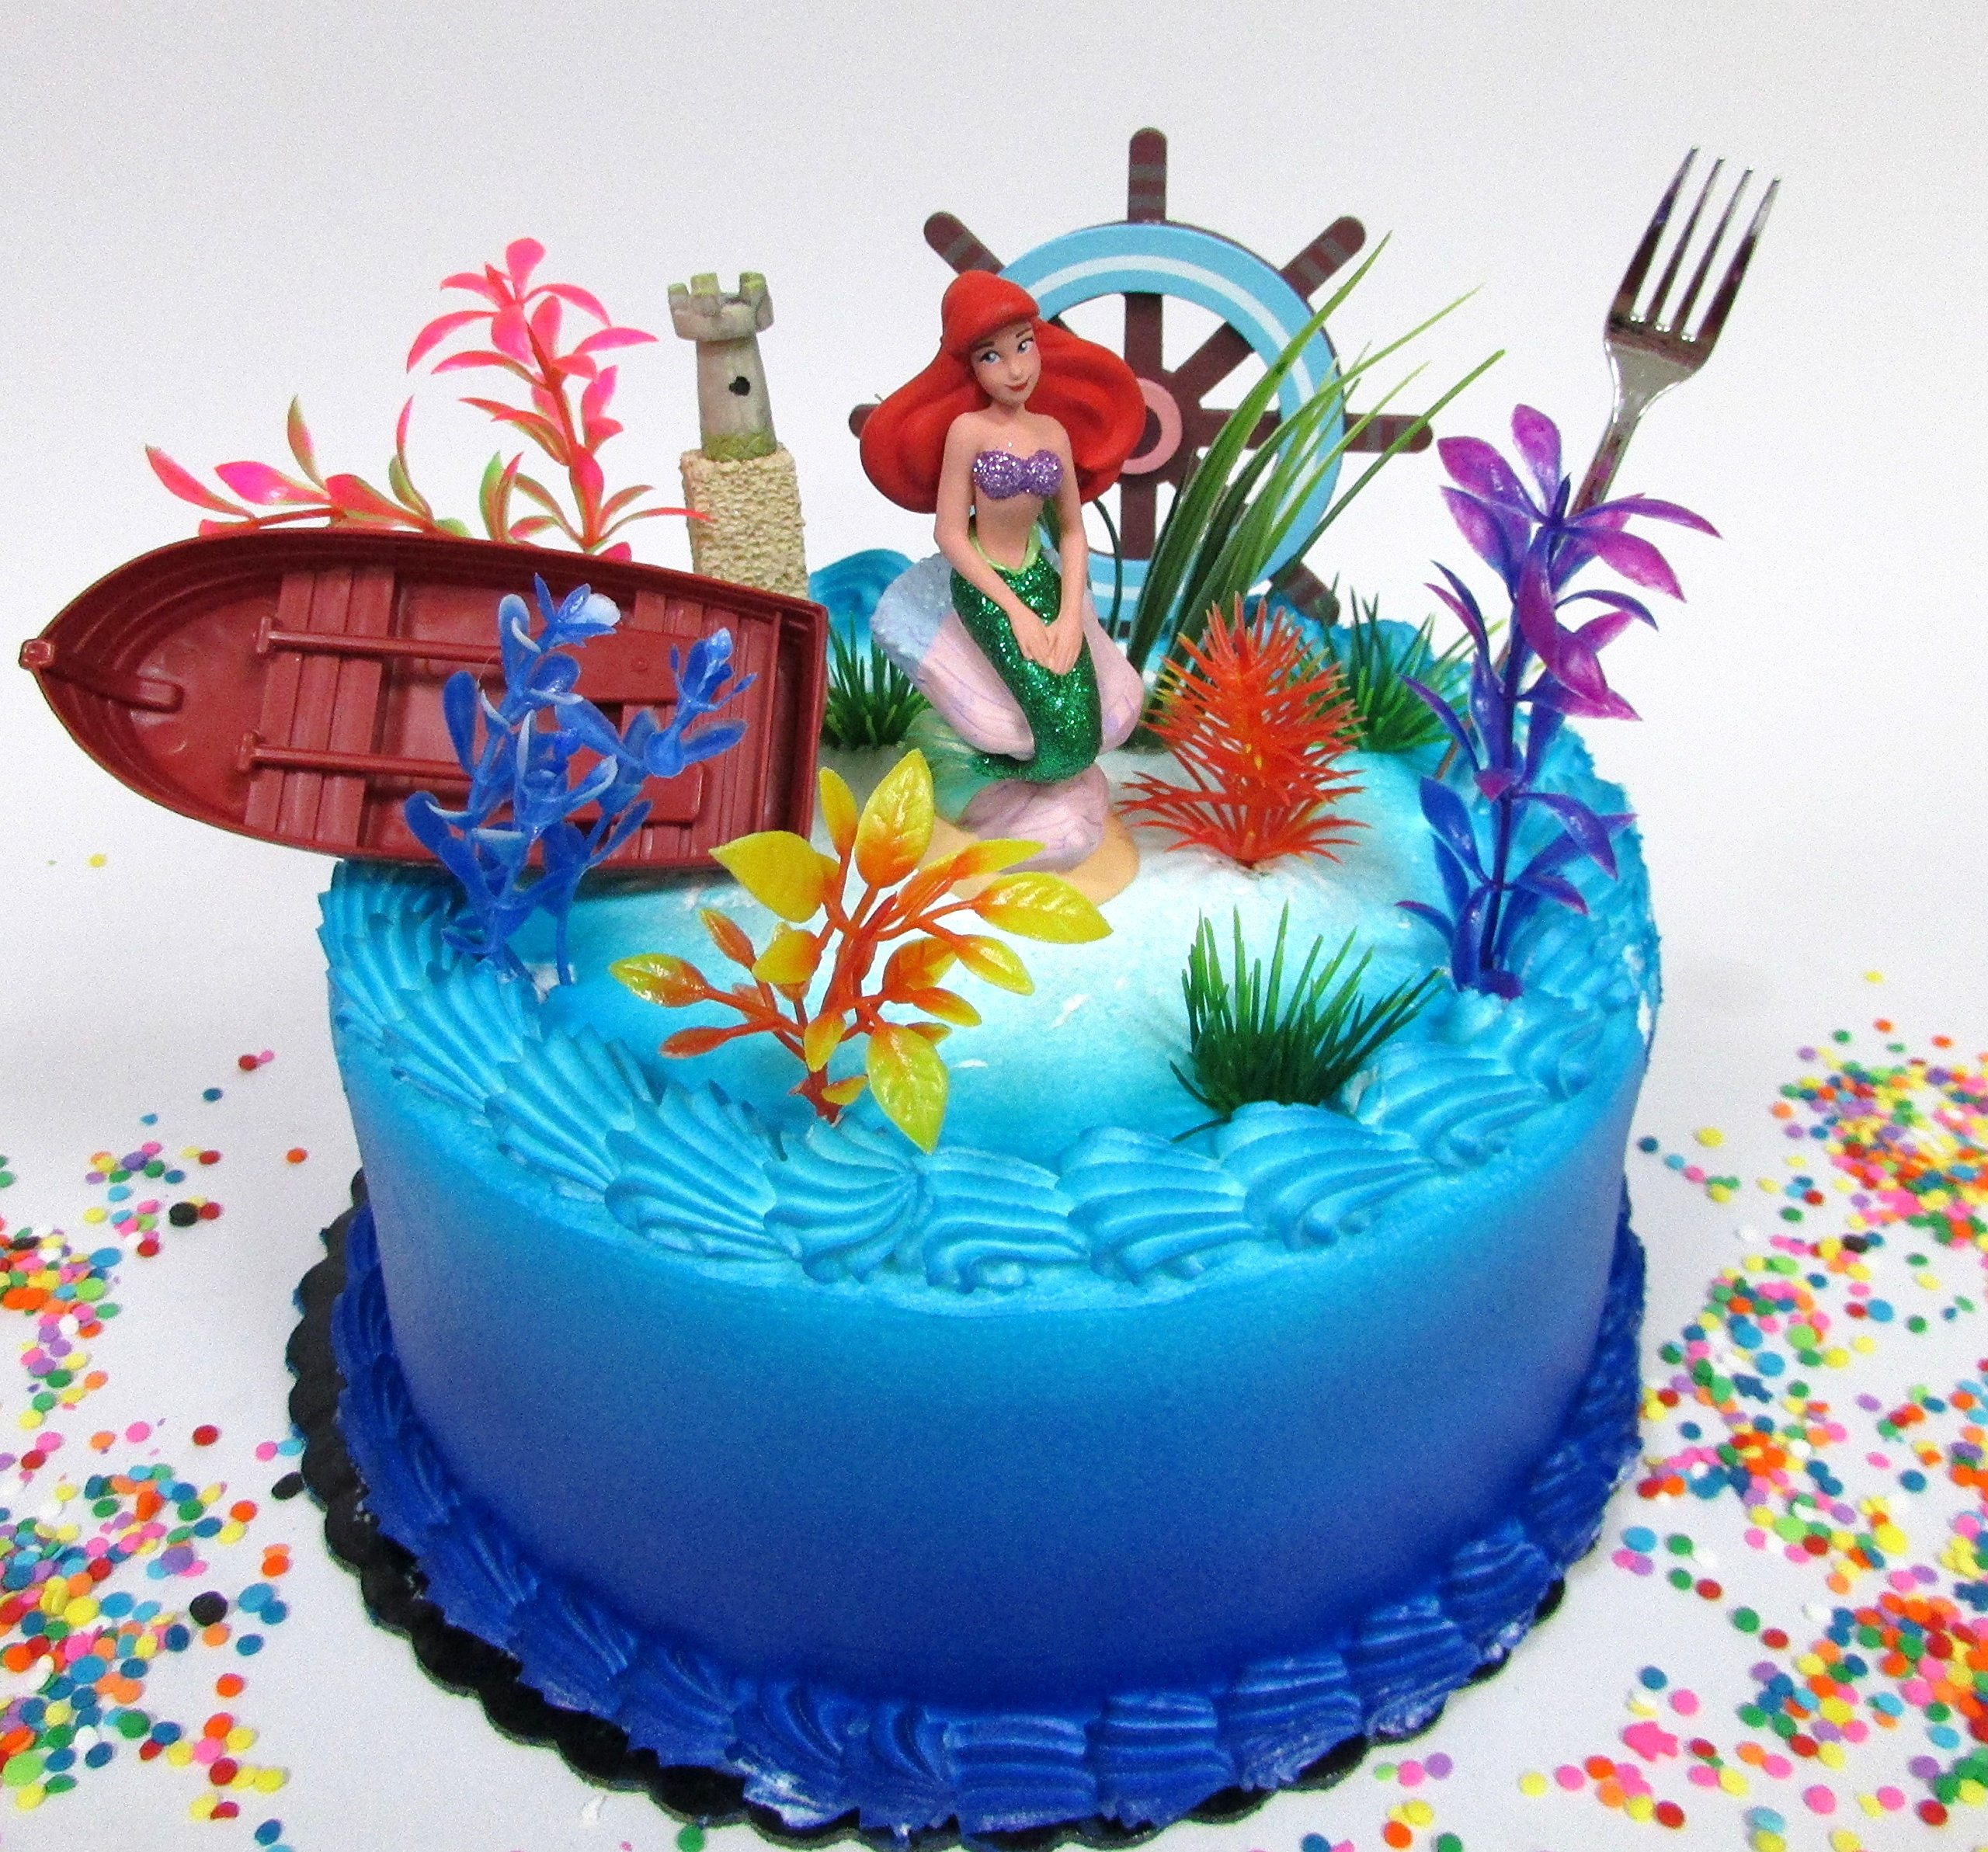 Little Mermaid Princess Ariel Themed Birthday Cake Topper Set